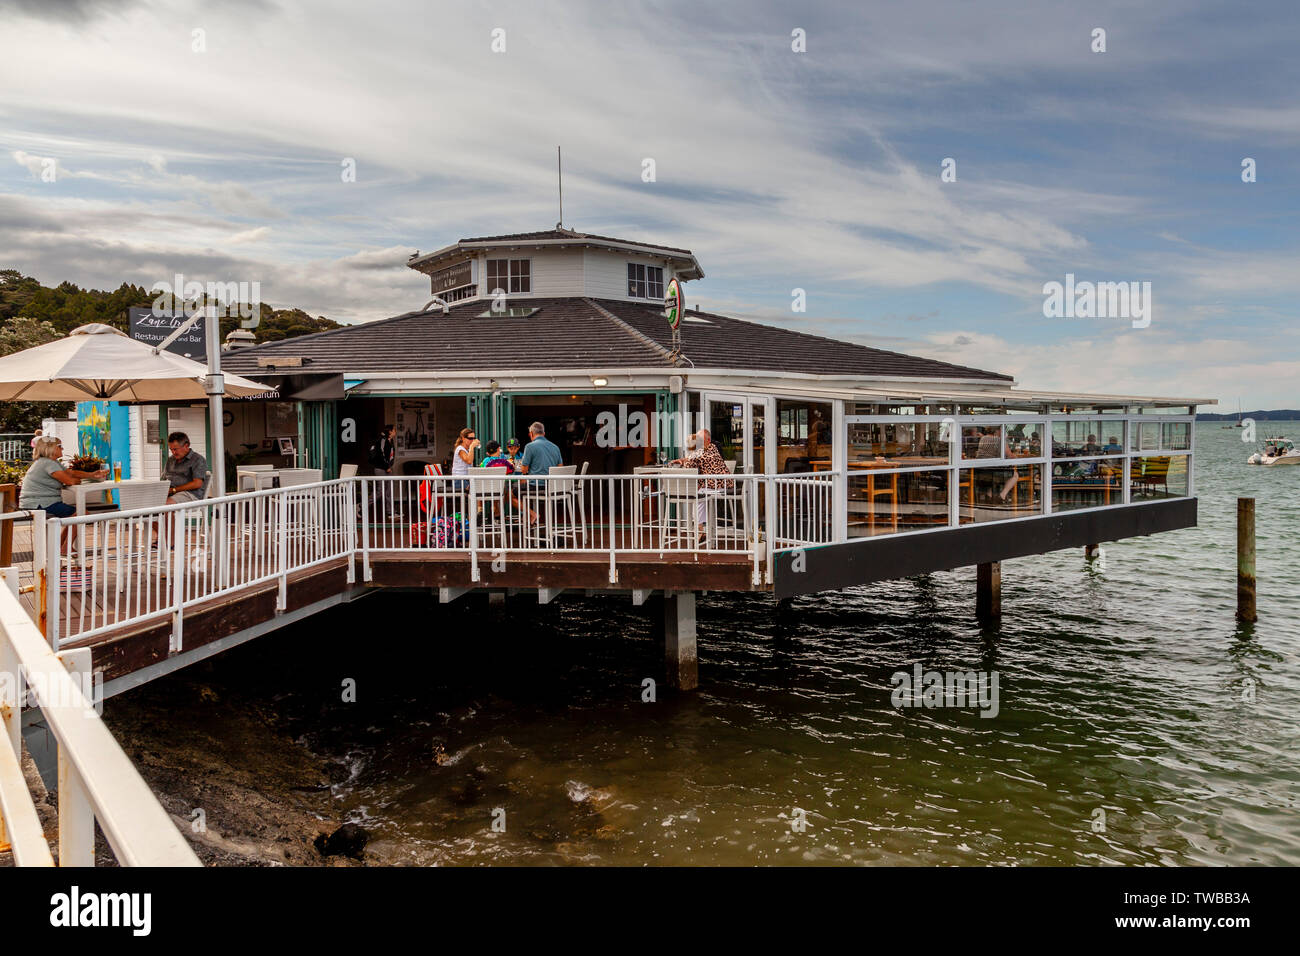 Seaside Cafe, Paihia, The Bay Of Islands, North Island, New Zealand - Stock Image